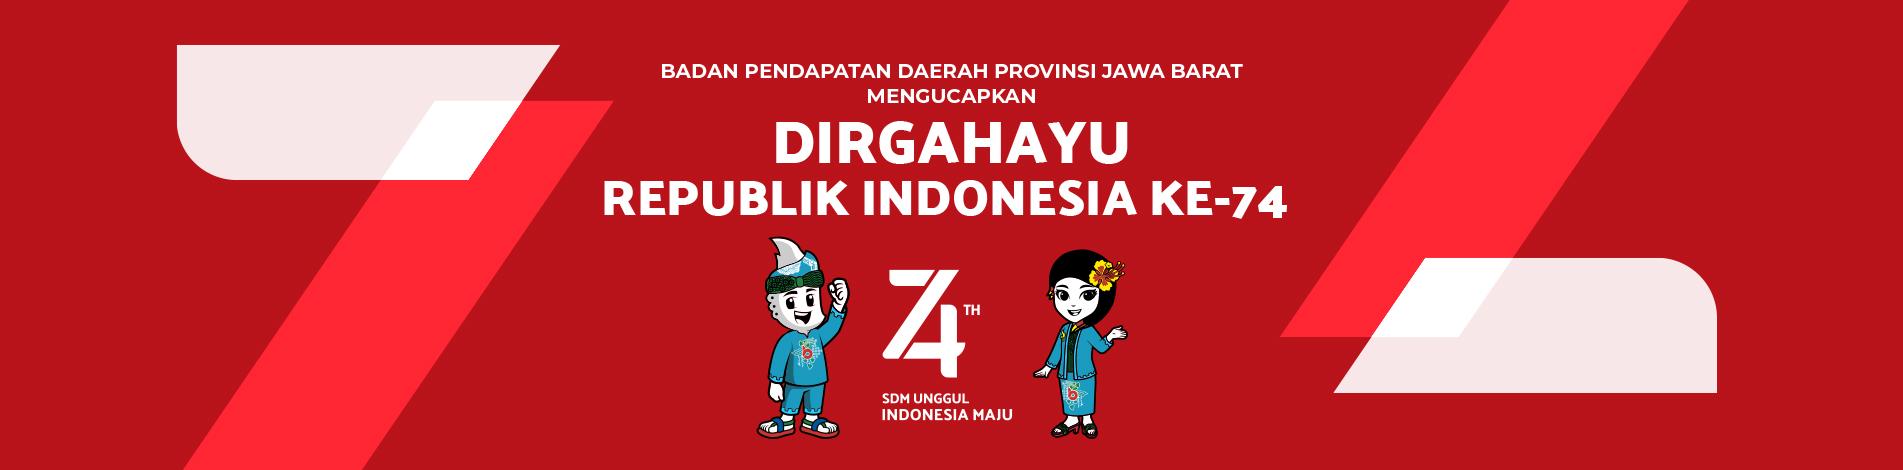 Banner Dirgahayu RI 74